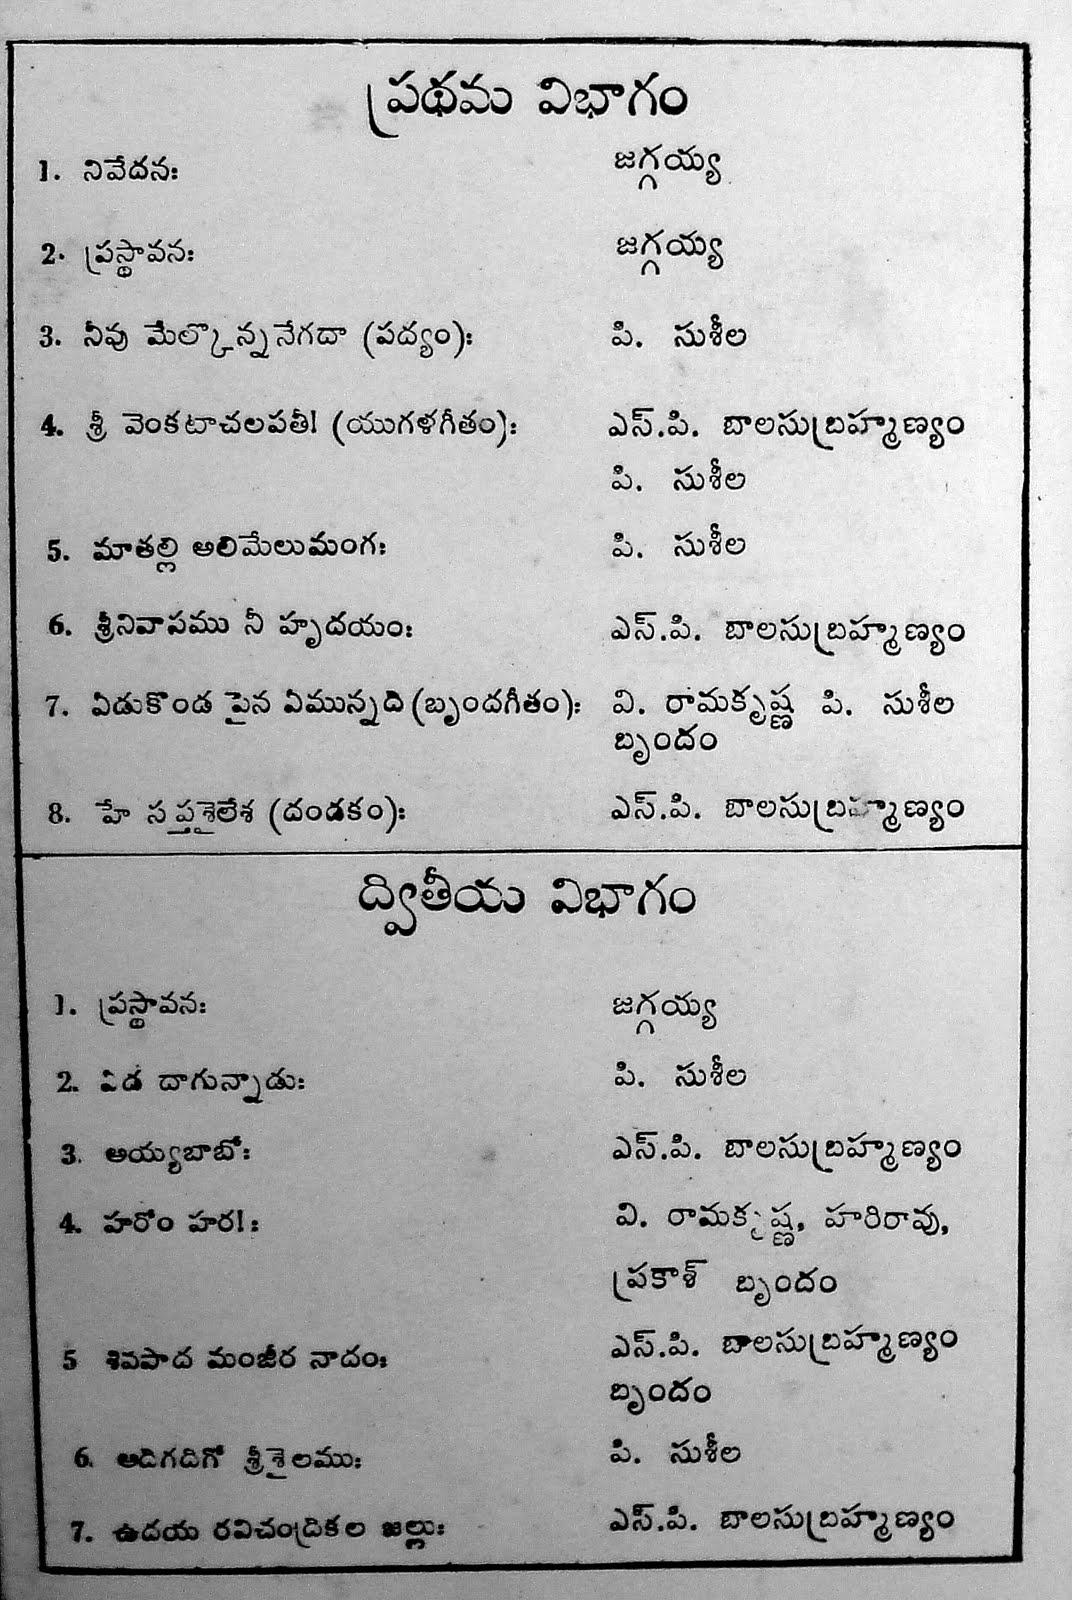 Download SP Balasubramanyam(SP Balu) Telugu Songs APK ...